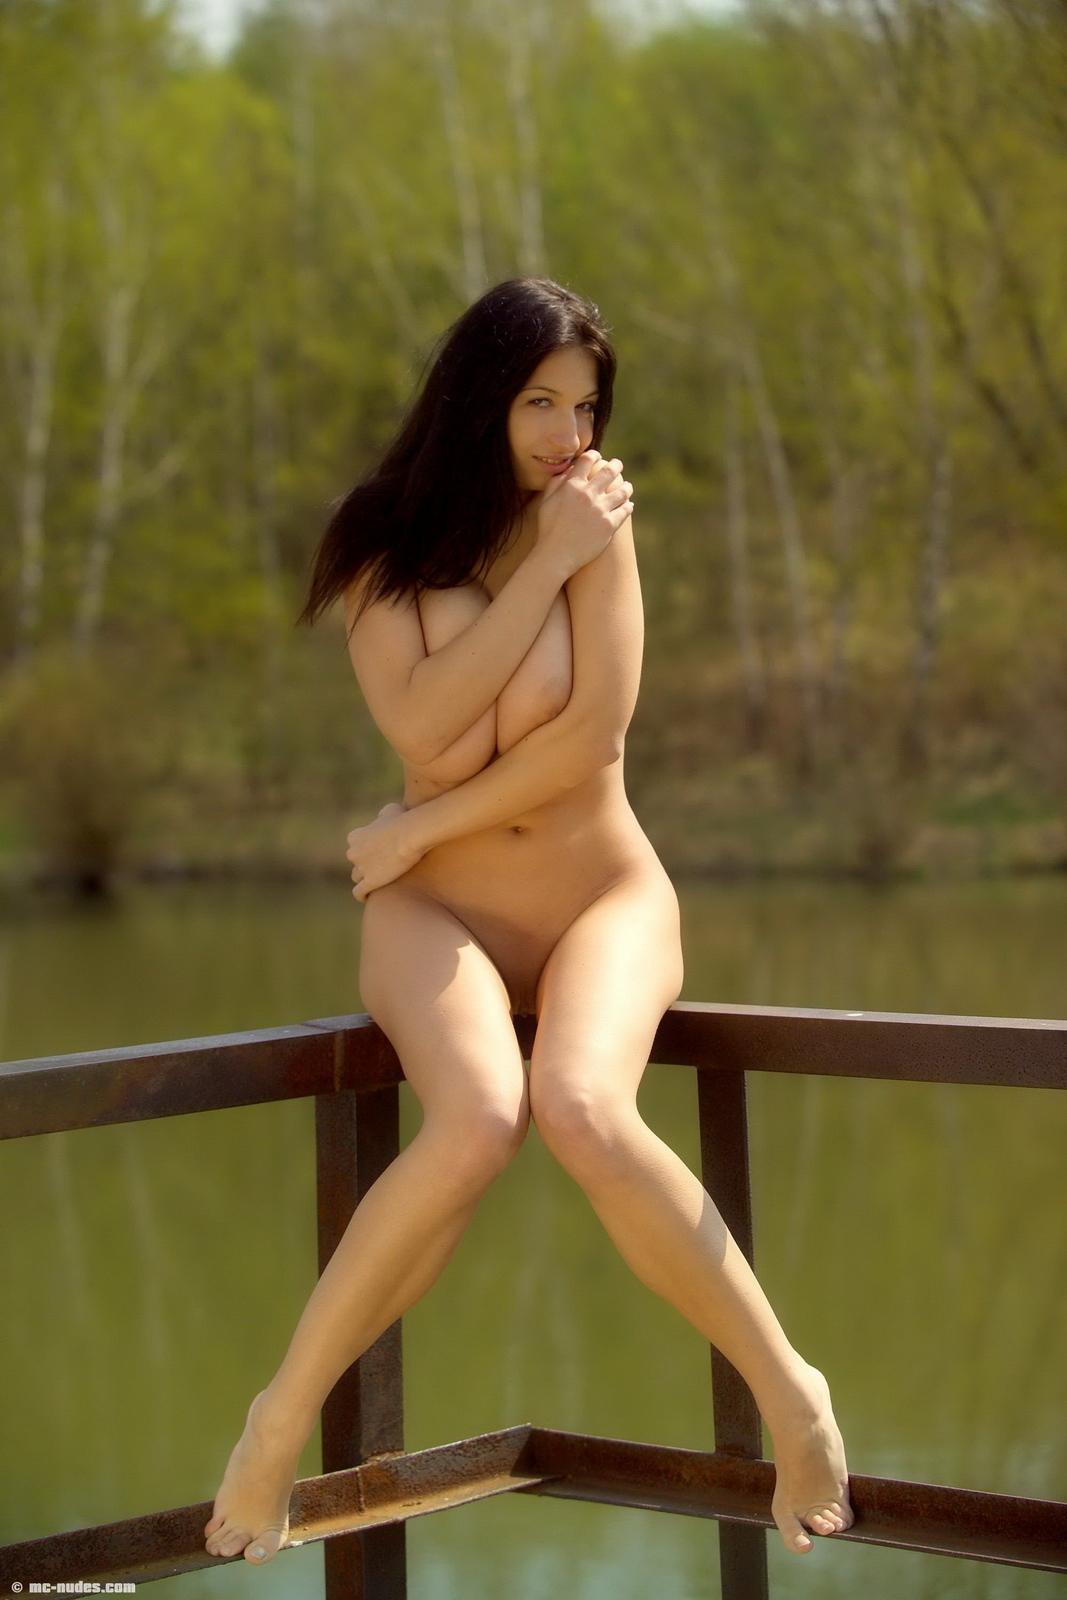 princessa-huge-tits-lake-brunette-naked-mcnudes-28